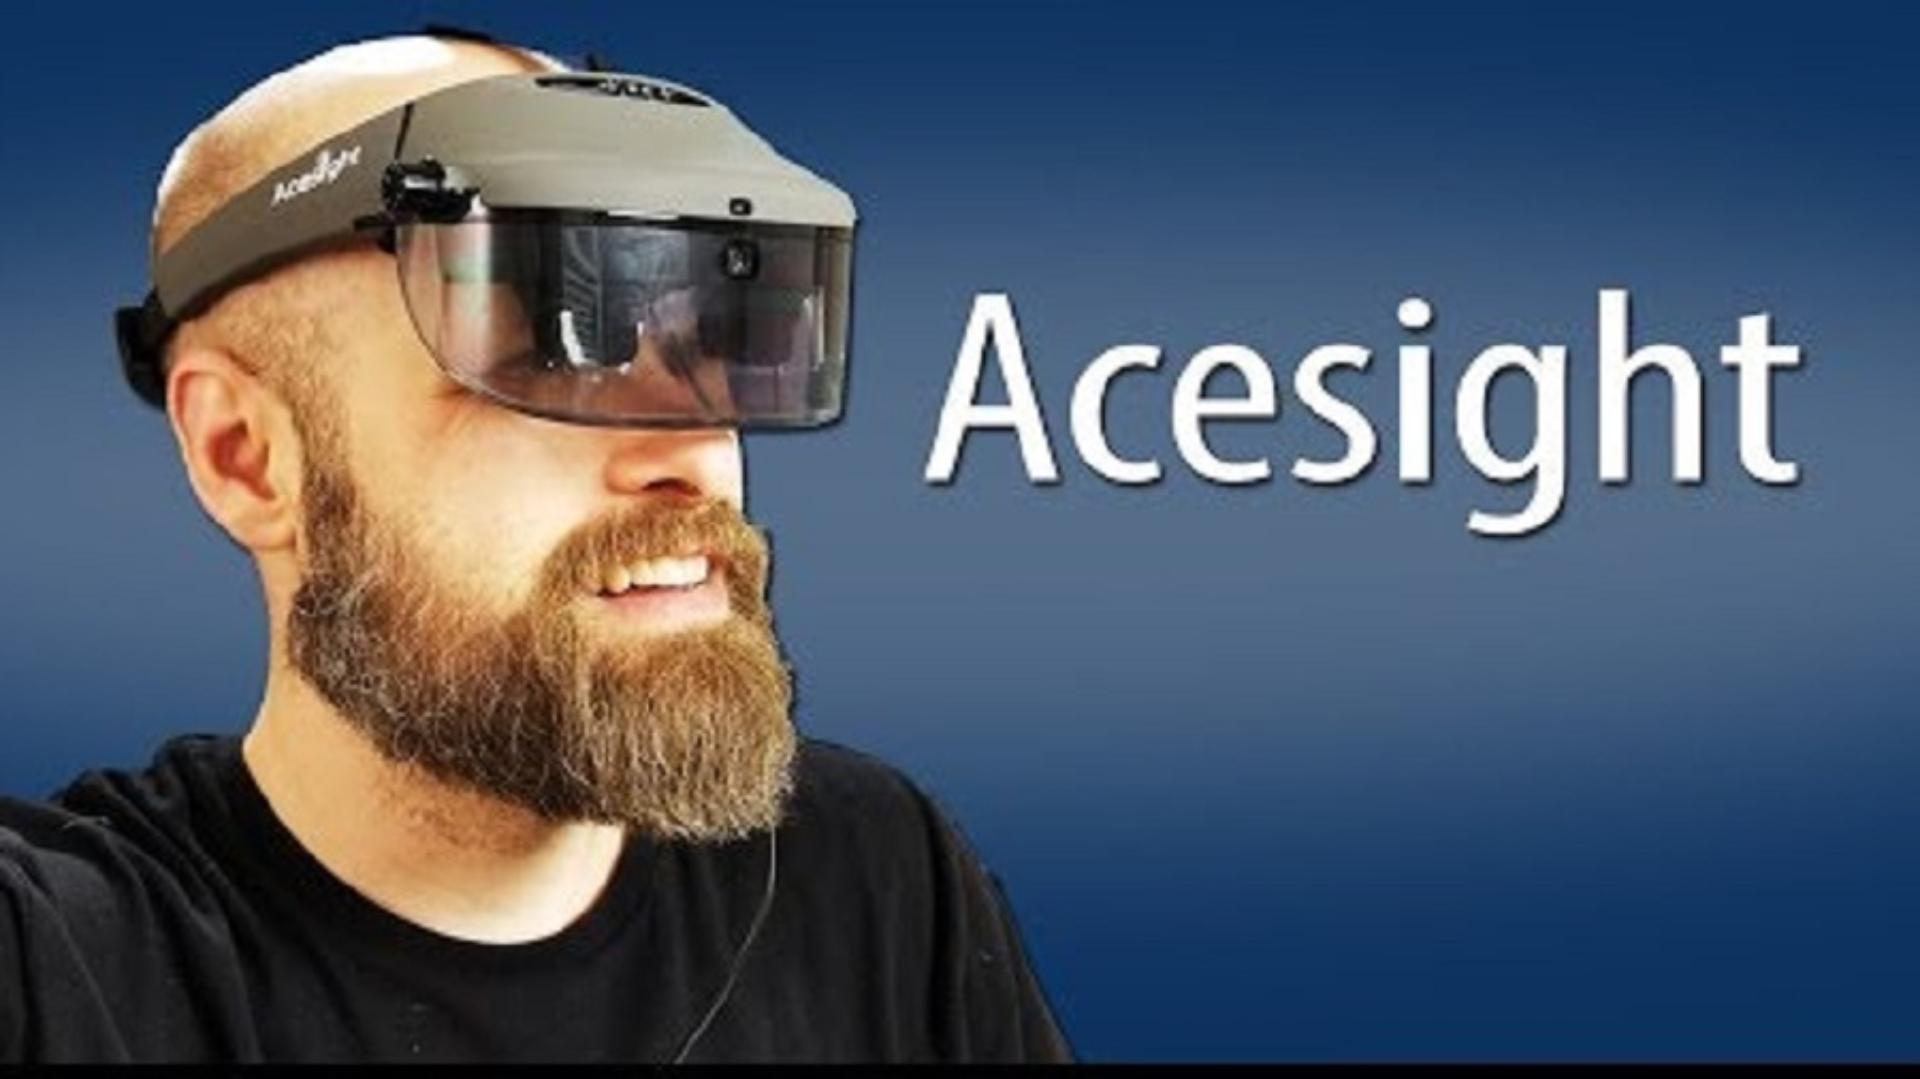 Sam wearing an Ace Sight device